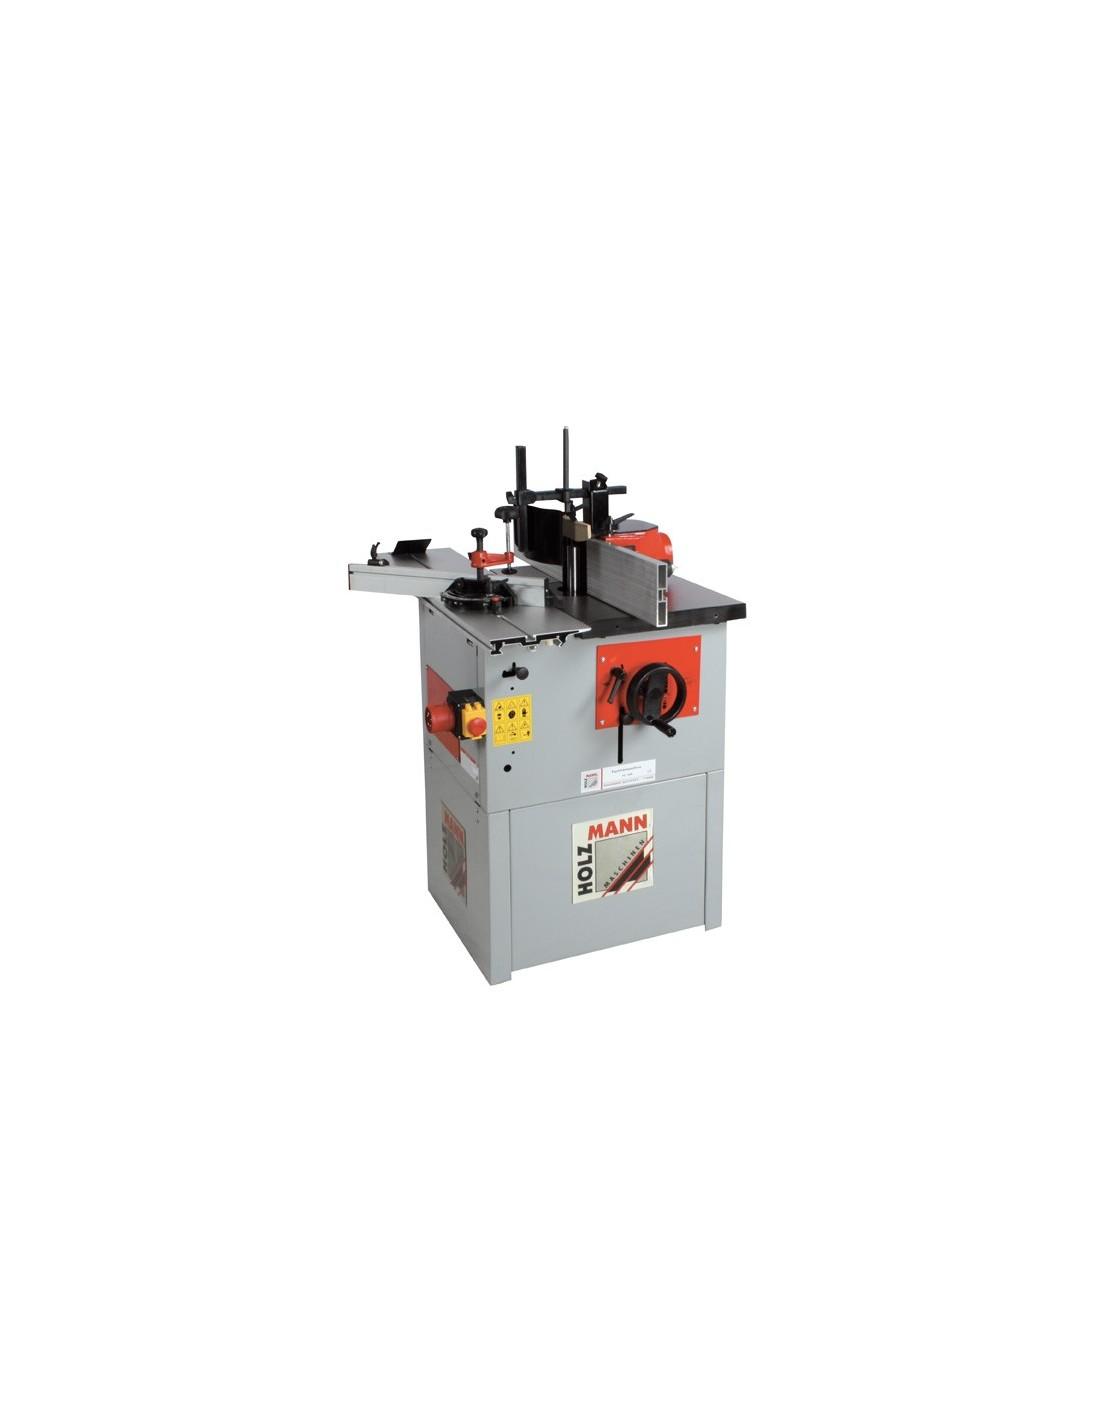 Masina pentru frezat cu masa de formatizat Holzmann FS 160L - 400 V